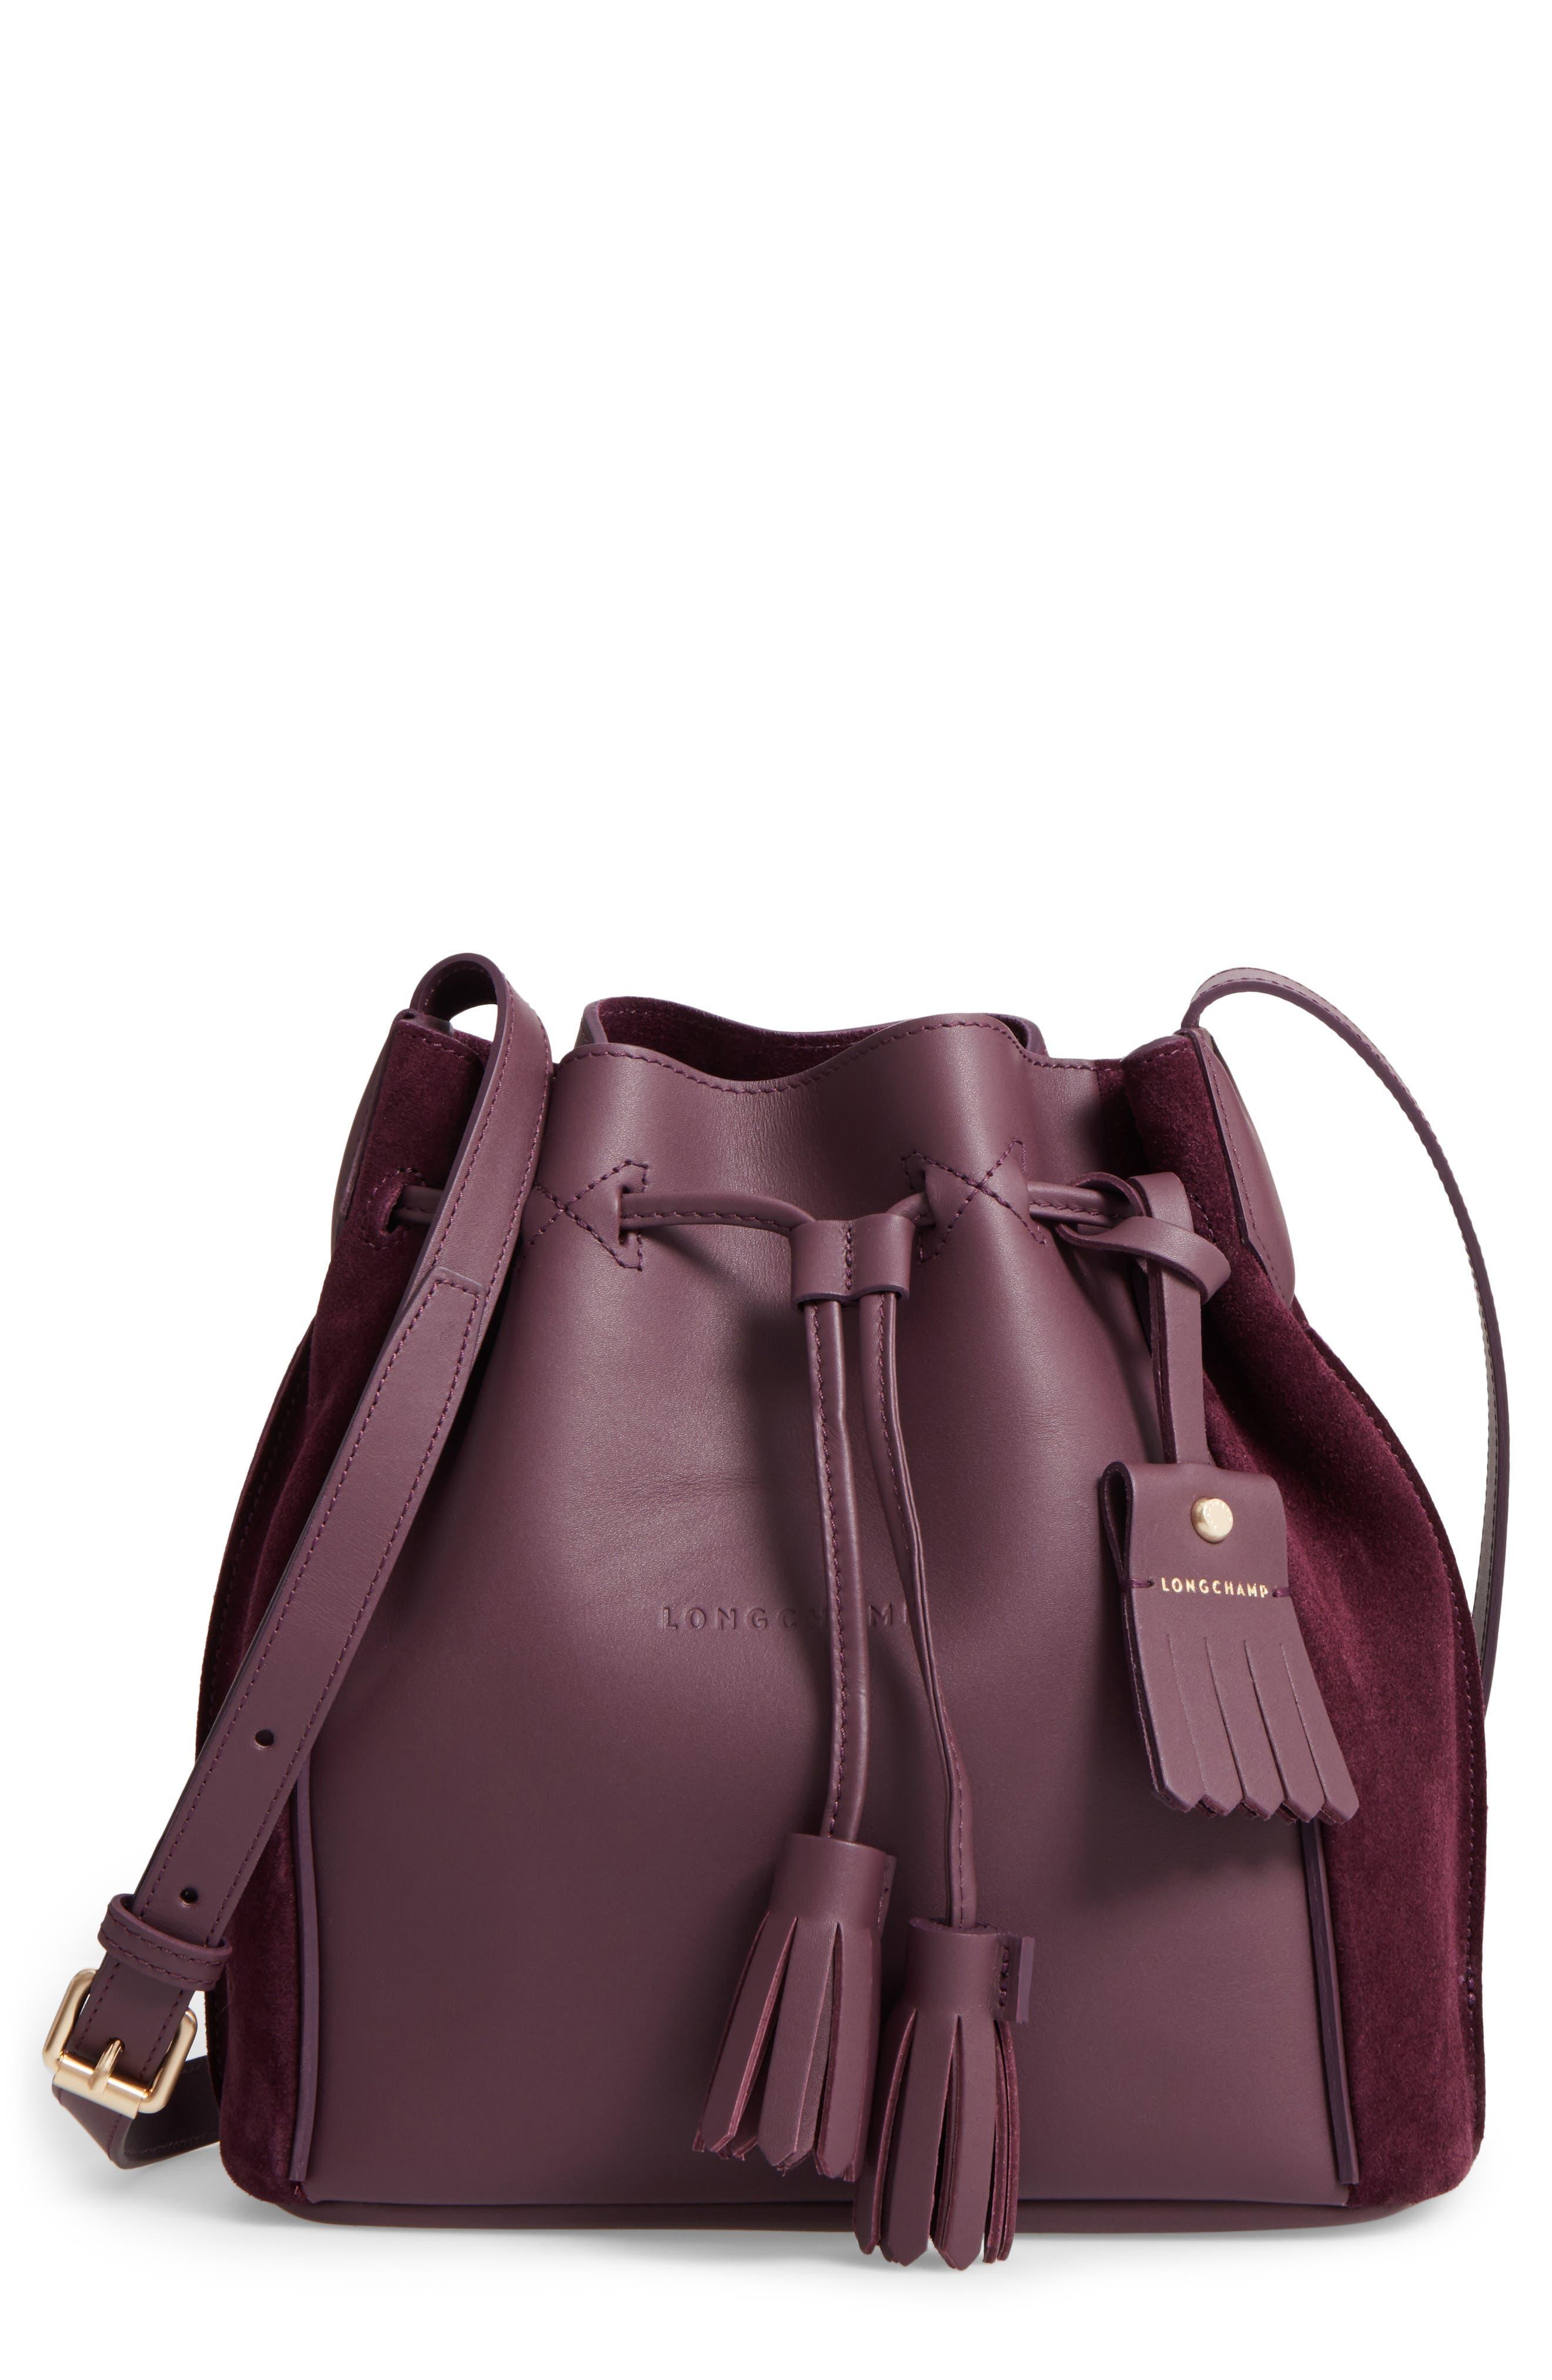 Penelope Fantasie Leather Bucket Bag,                         Main,                         color,